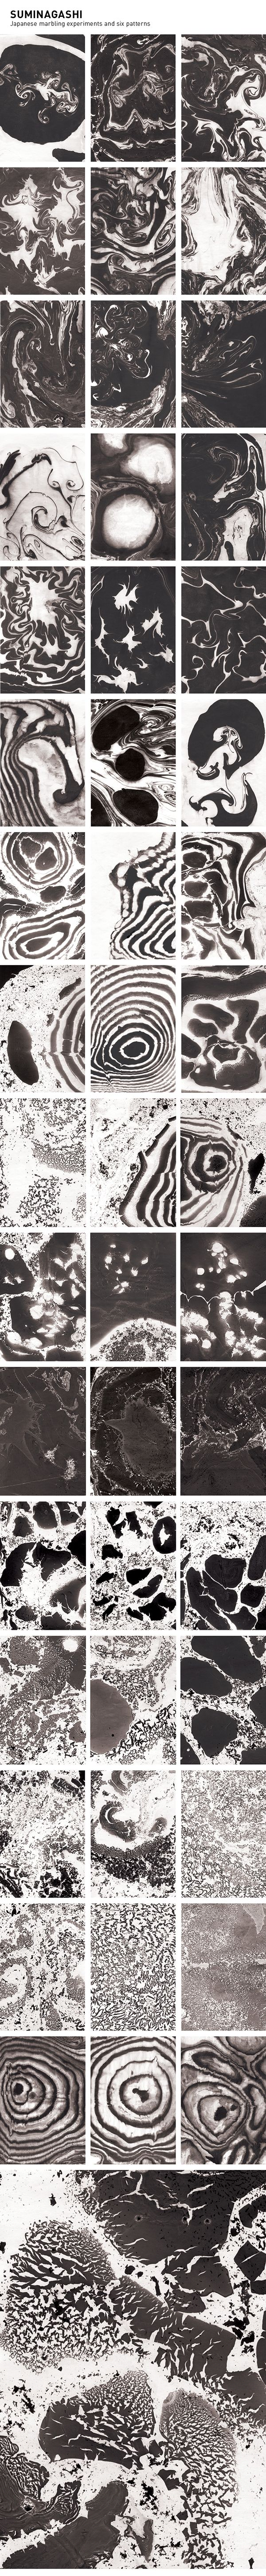 Suminagashi Experiments and Patterns on Behance